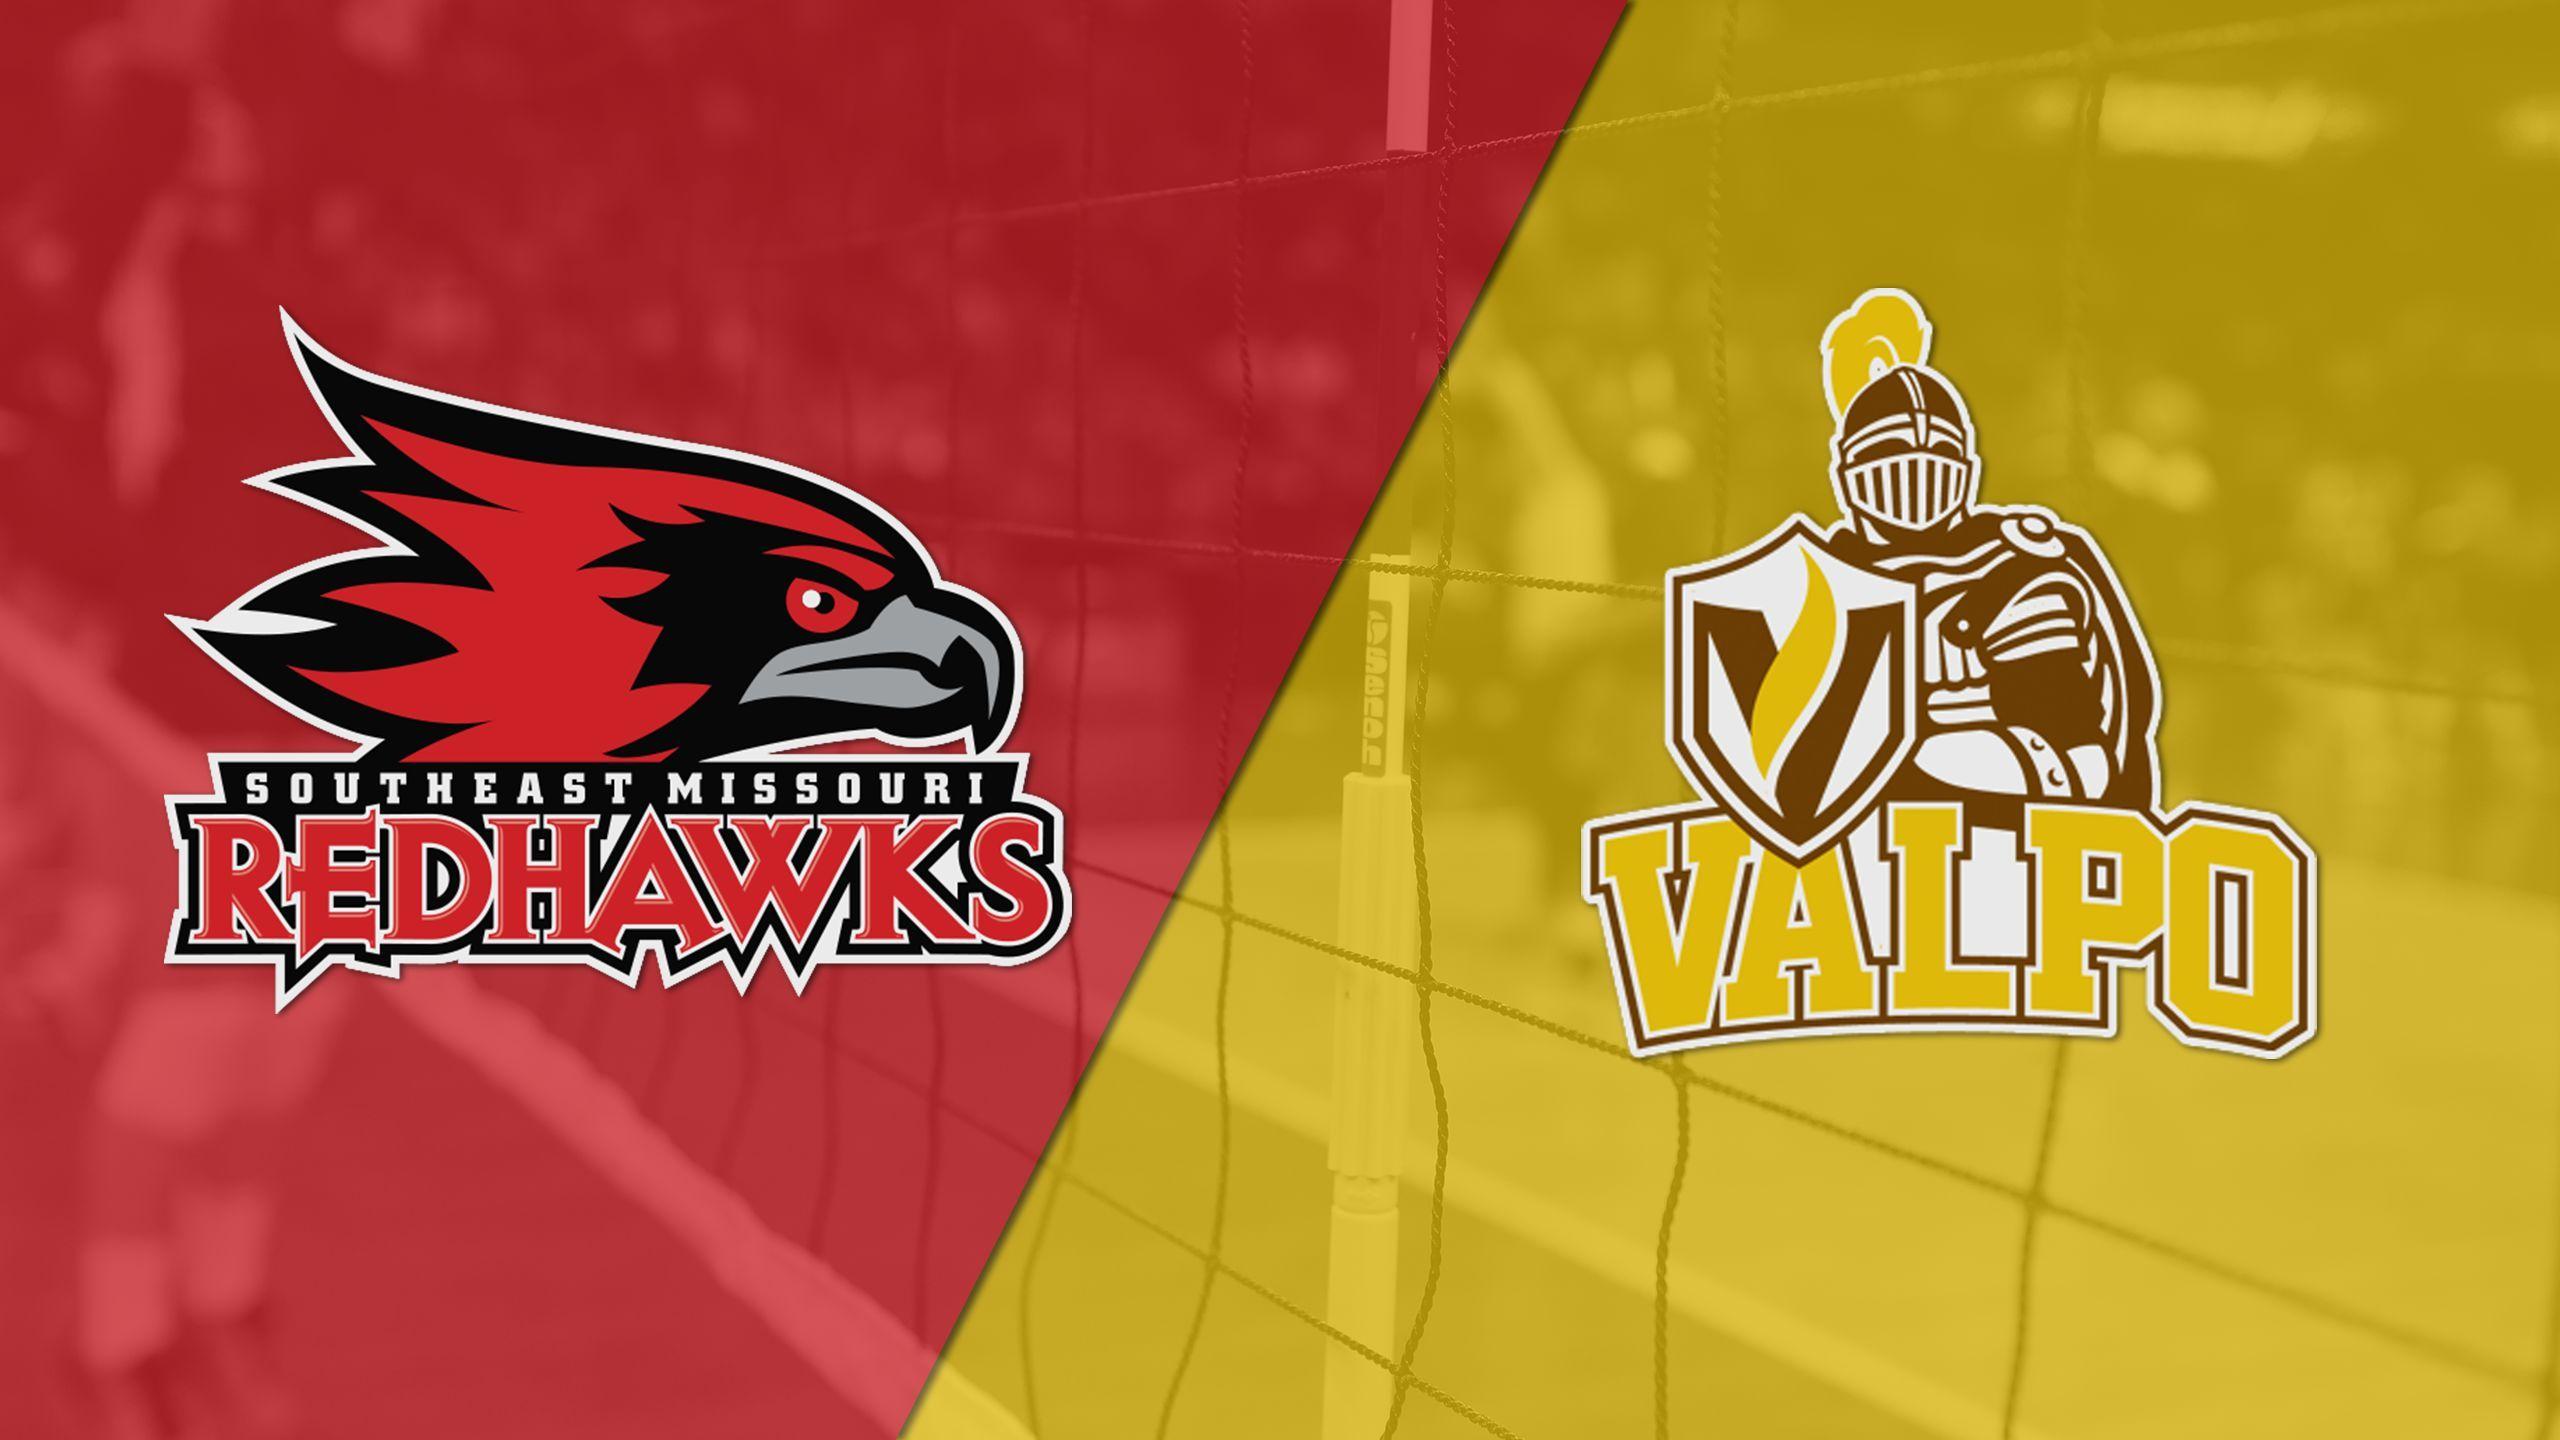 Southeast Missouri State vs. Valparaiso (W Volleyball)